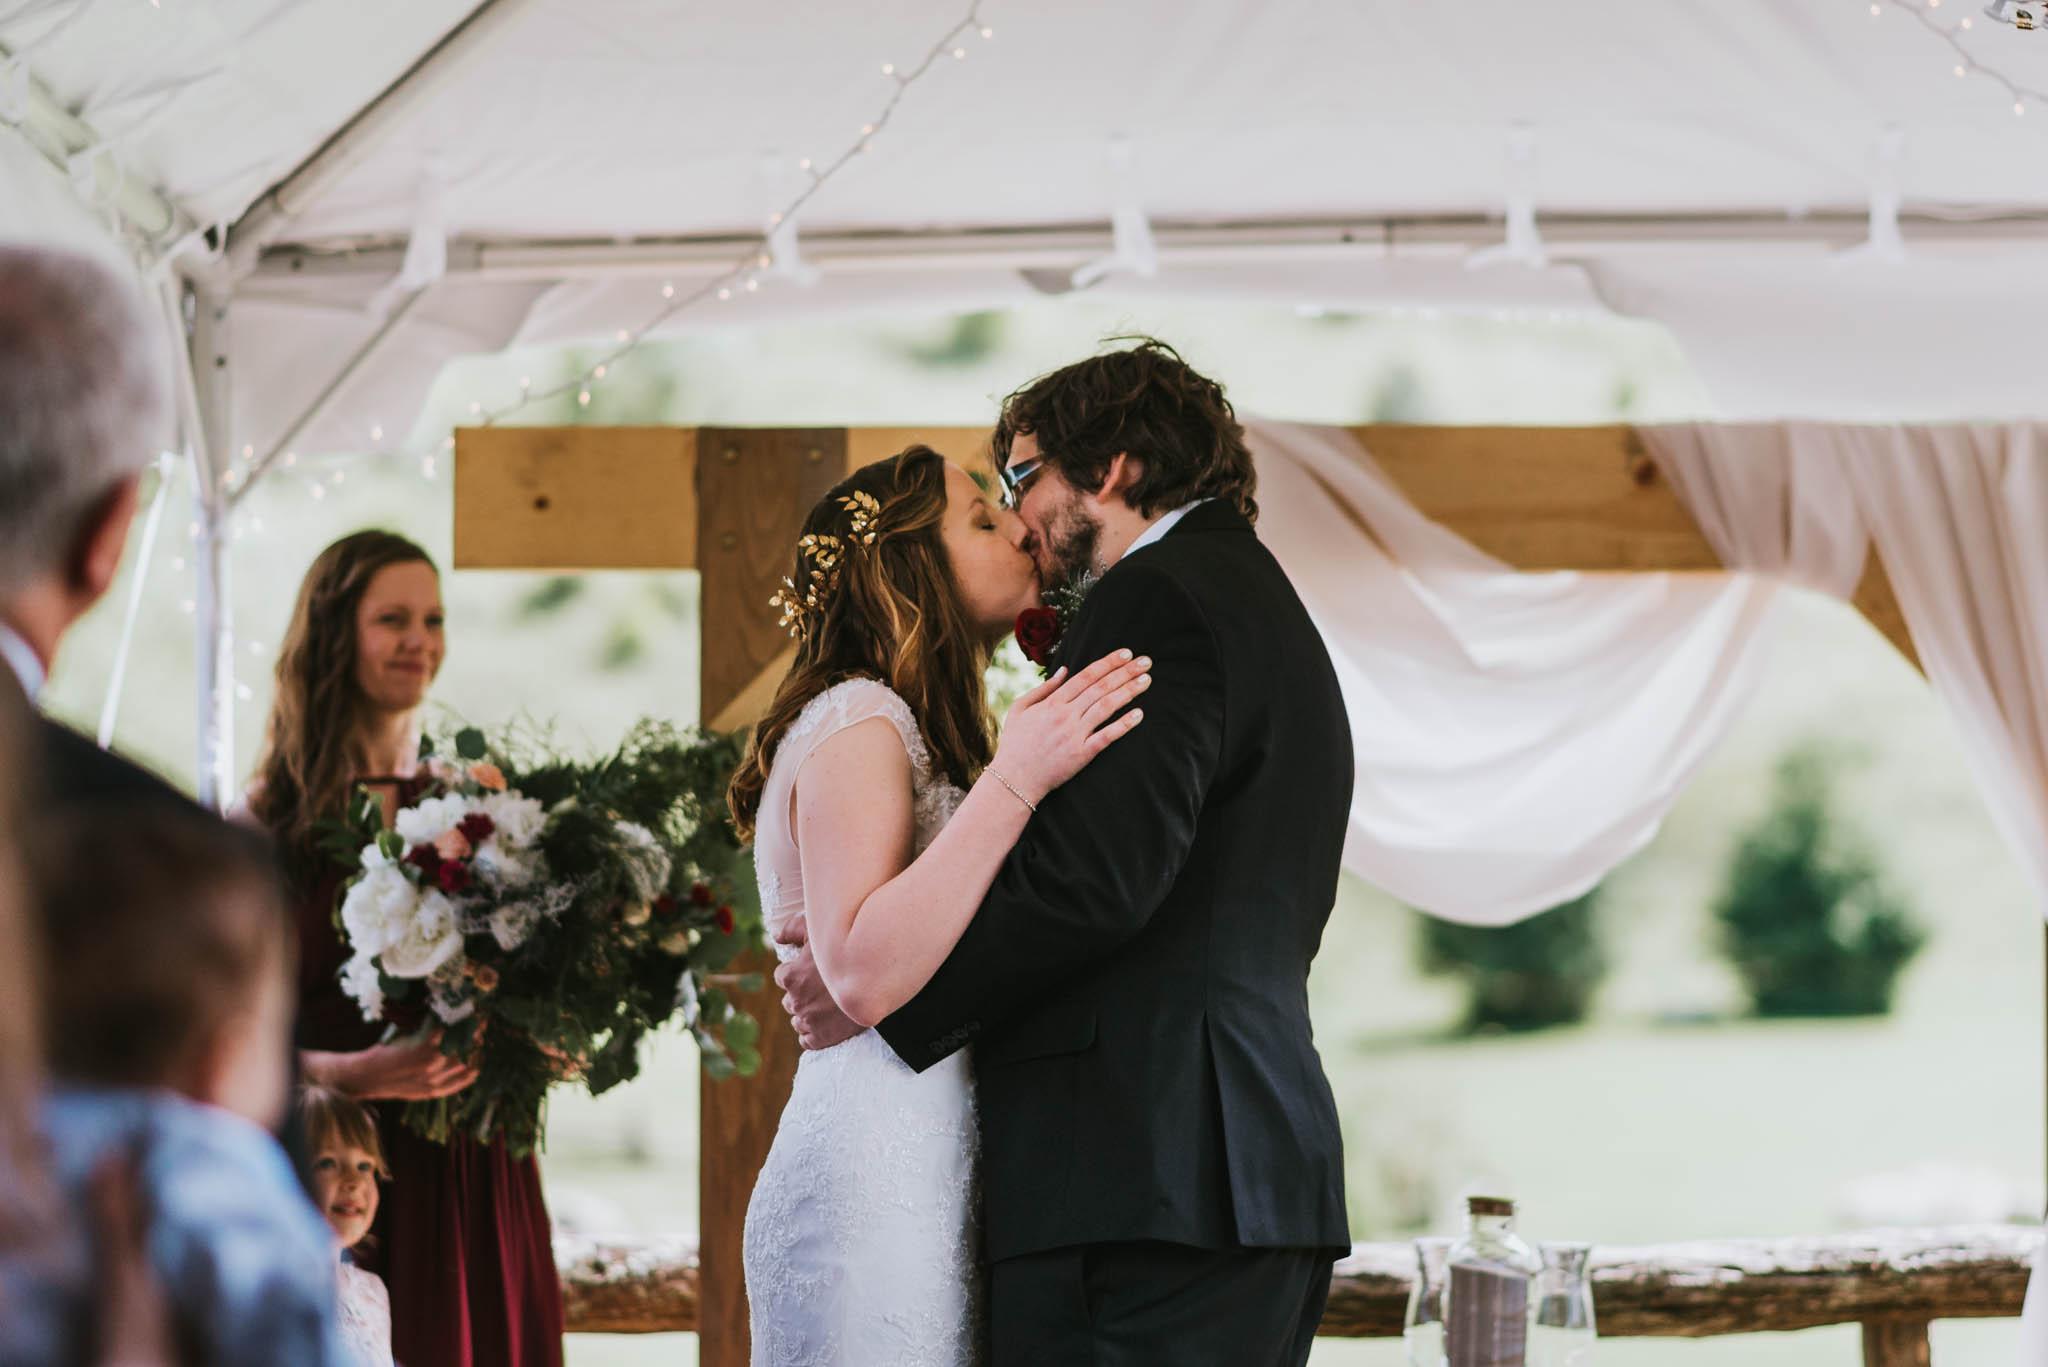 White Fence Farm Wedding, Boone, NC, Northeast TN Wedding Photographer, East Tennessee Wedding Photographer, Knoxville, TN Wedding Photographer